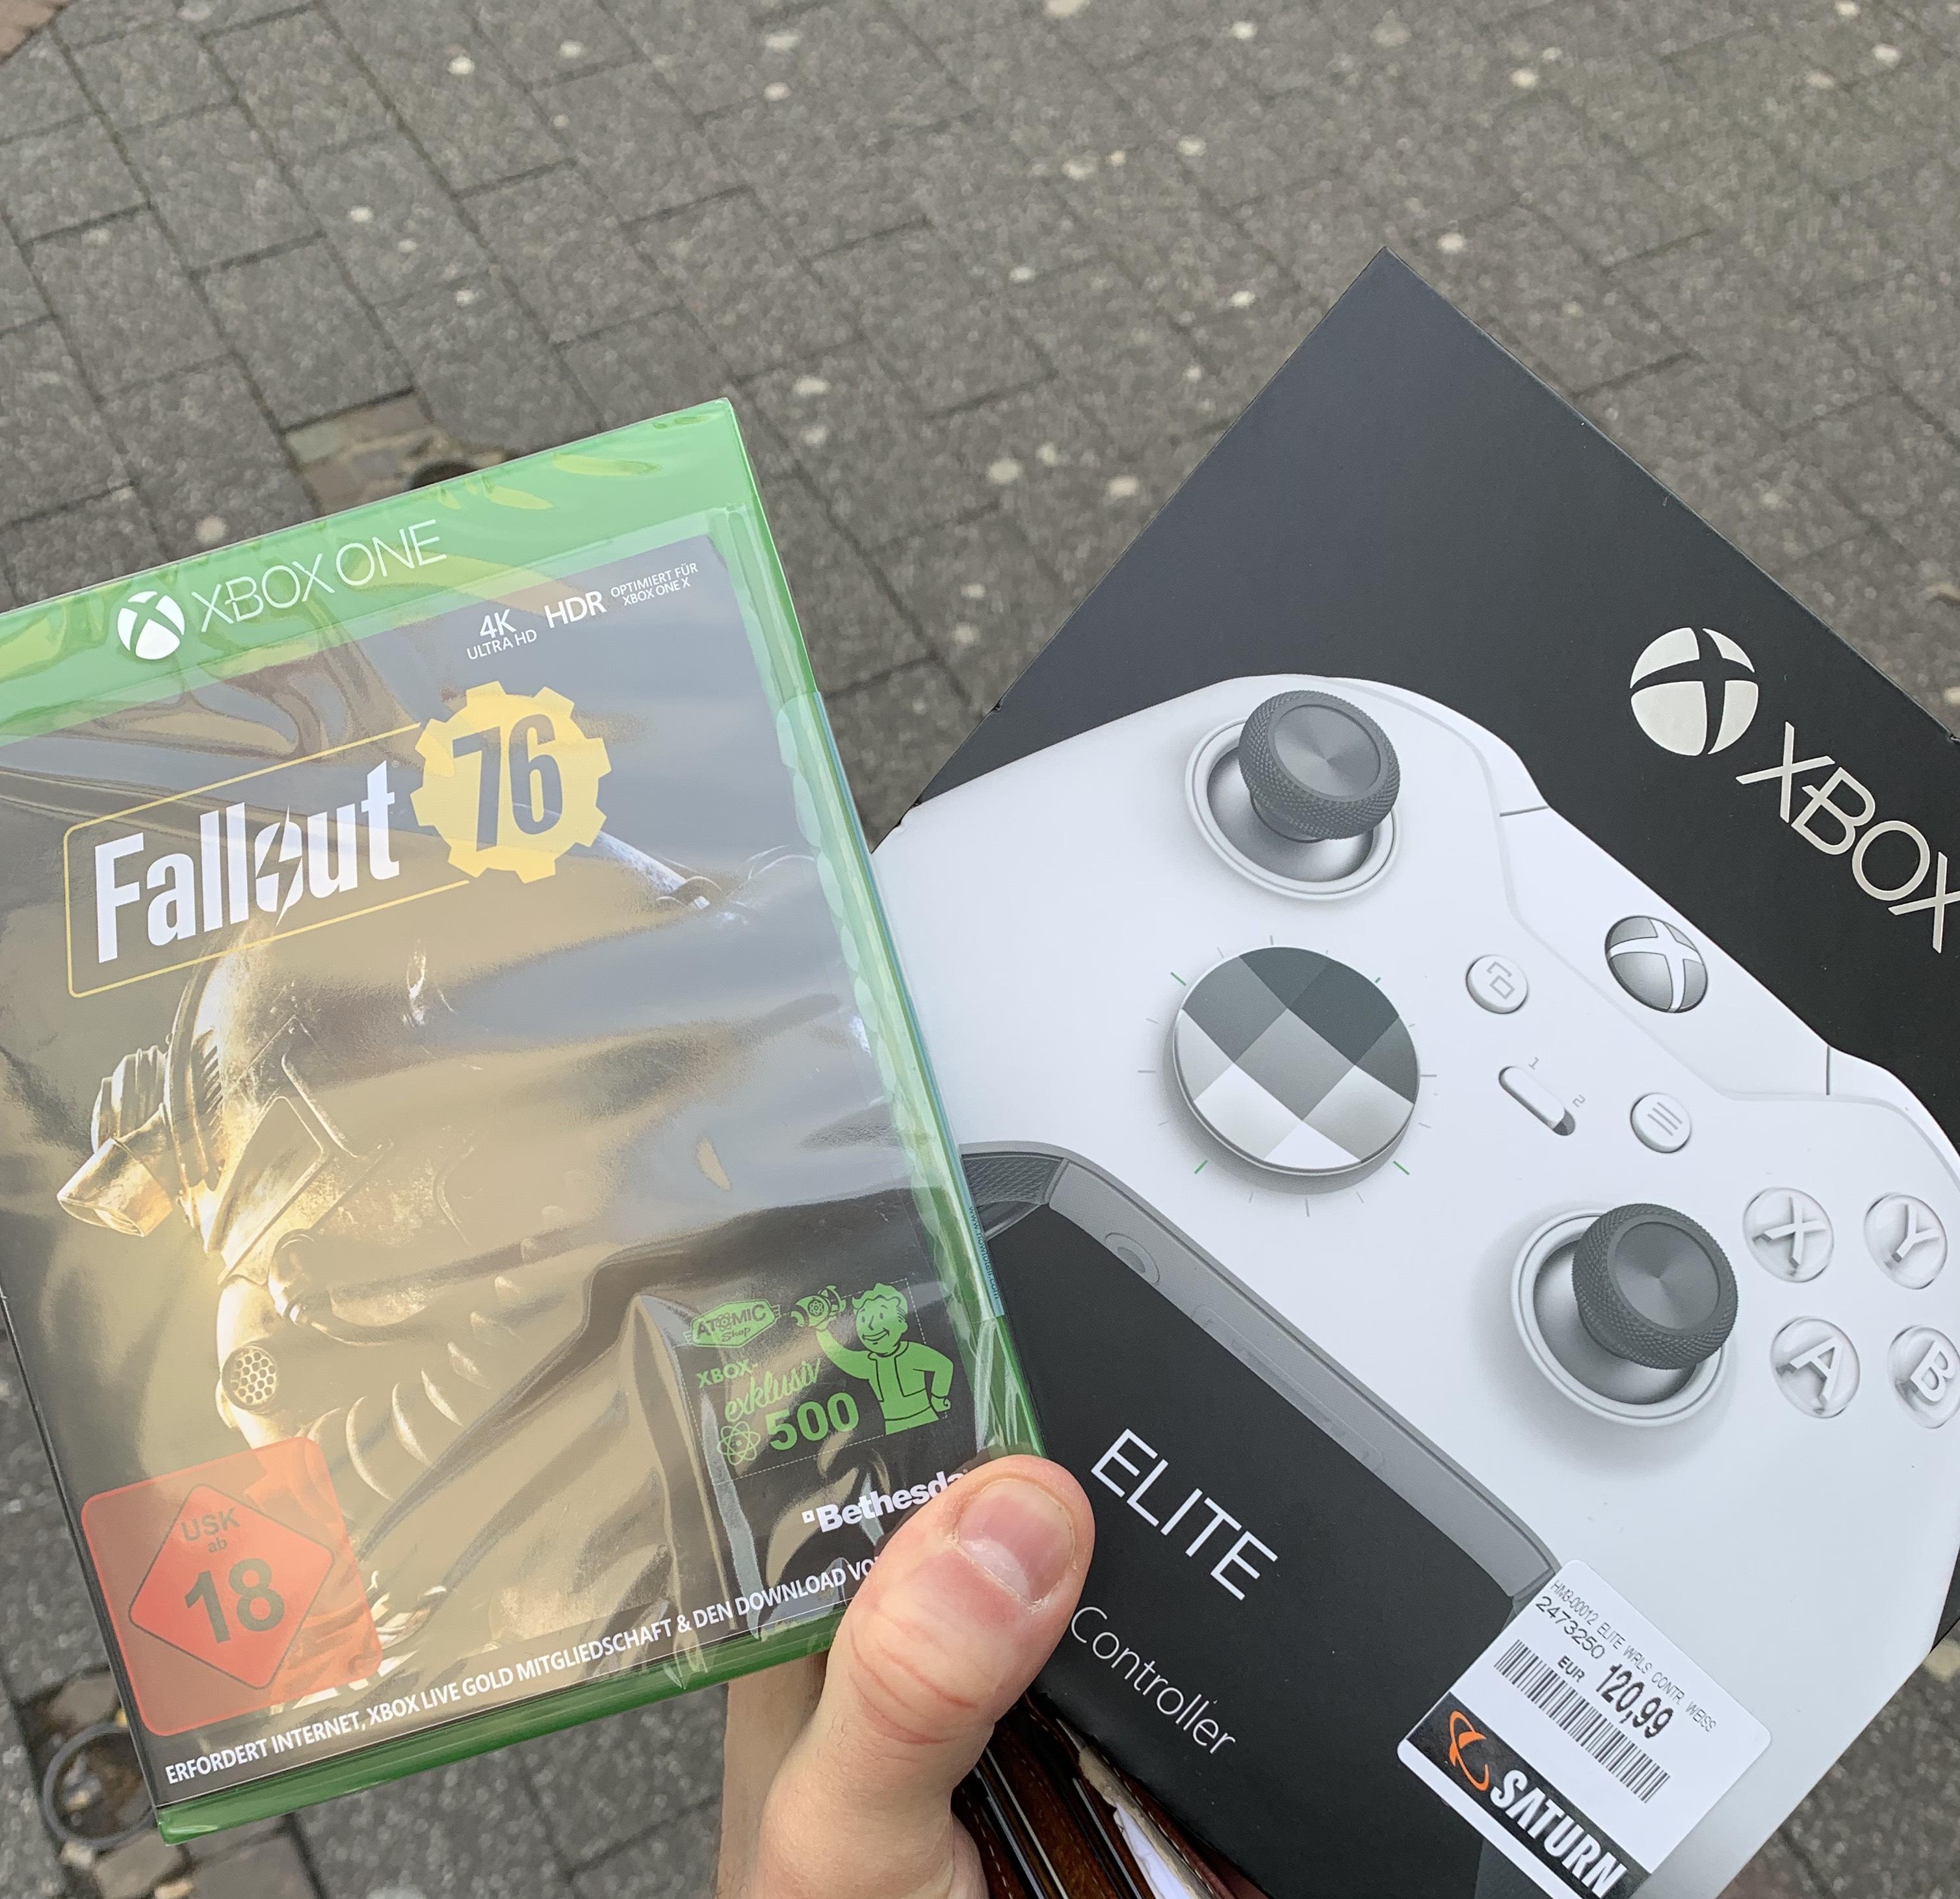 [Lokal Köln] XBOX one Elite Controller plus Fallout 76